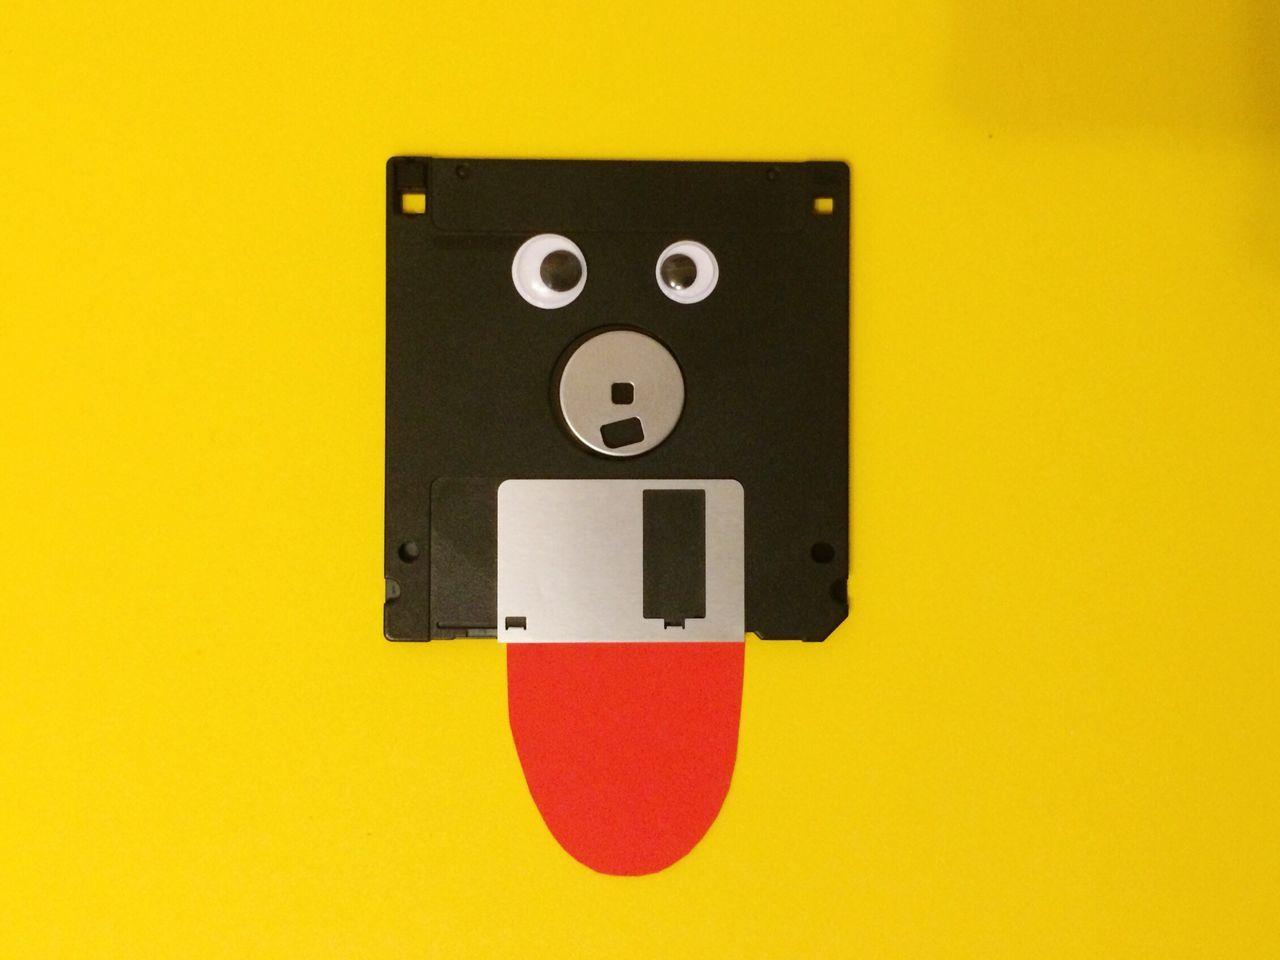 Anthropomorphic Floppy Disk Against Yellow Background